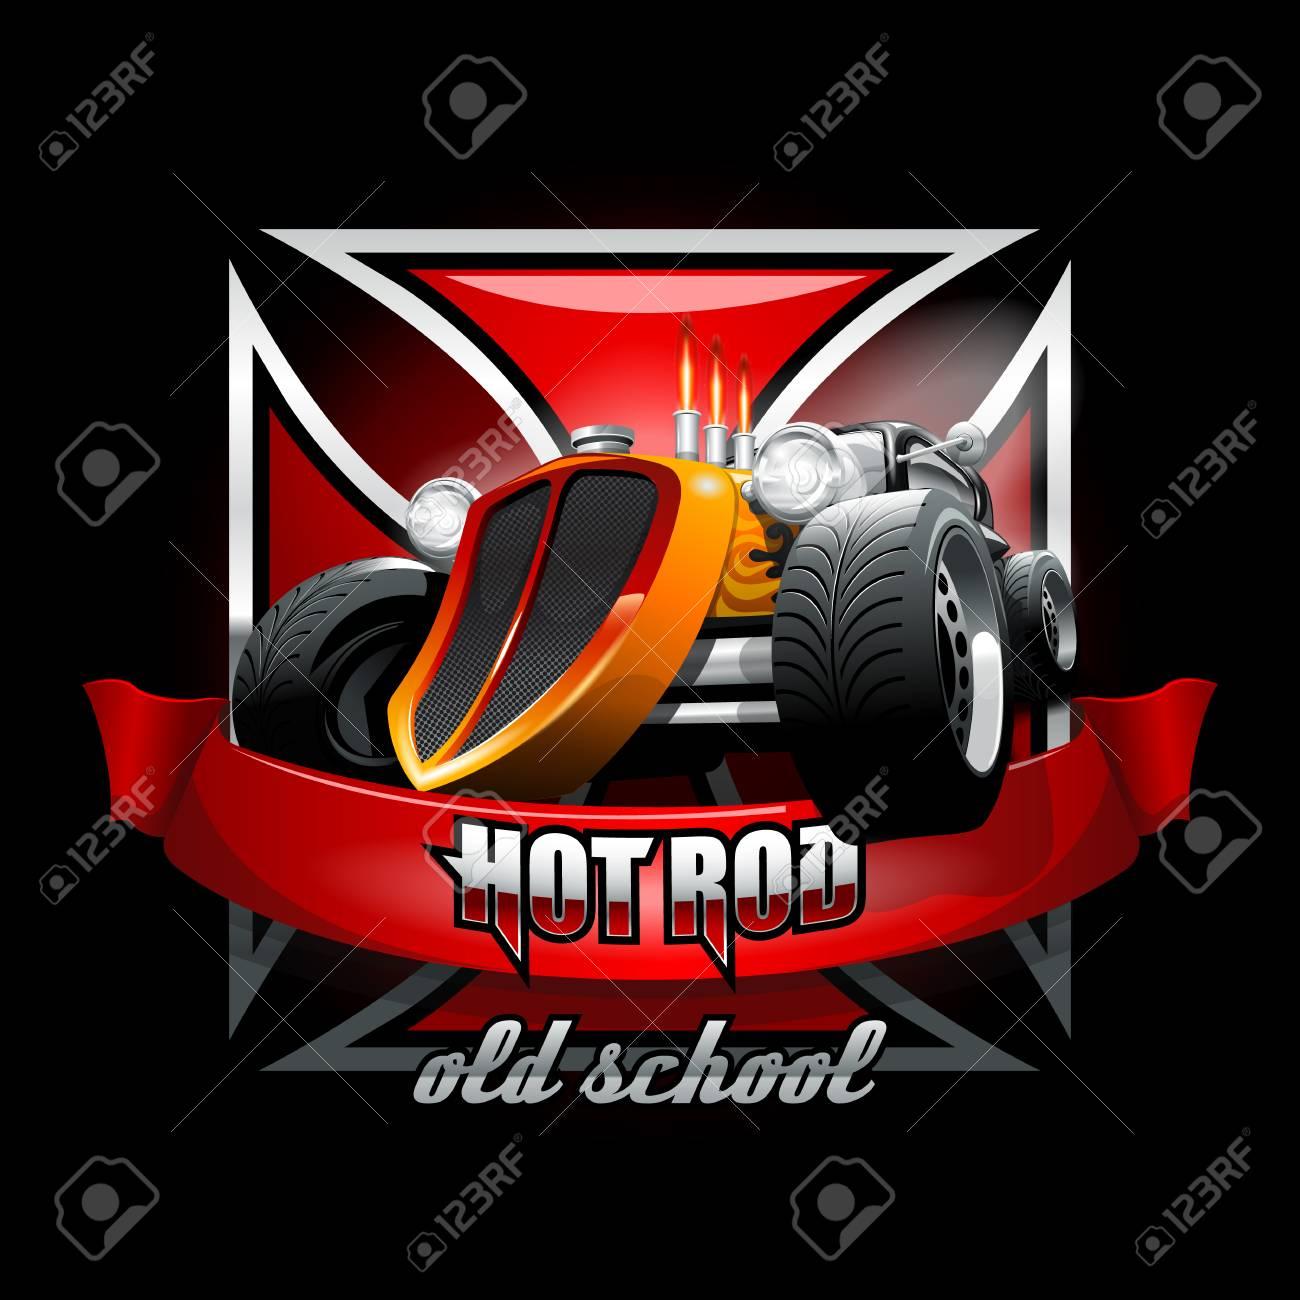 Iron Cross Hot Rod Logo Mockup  Layered and editable